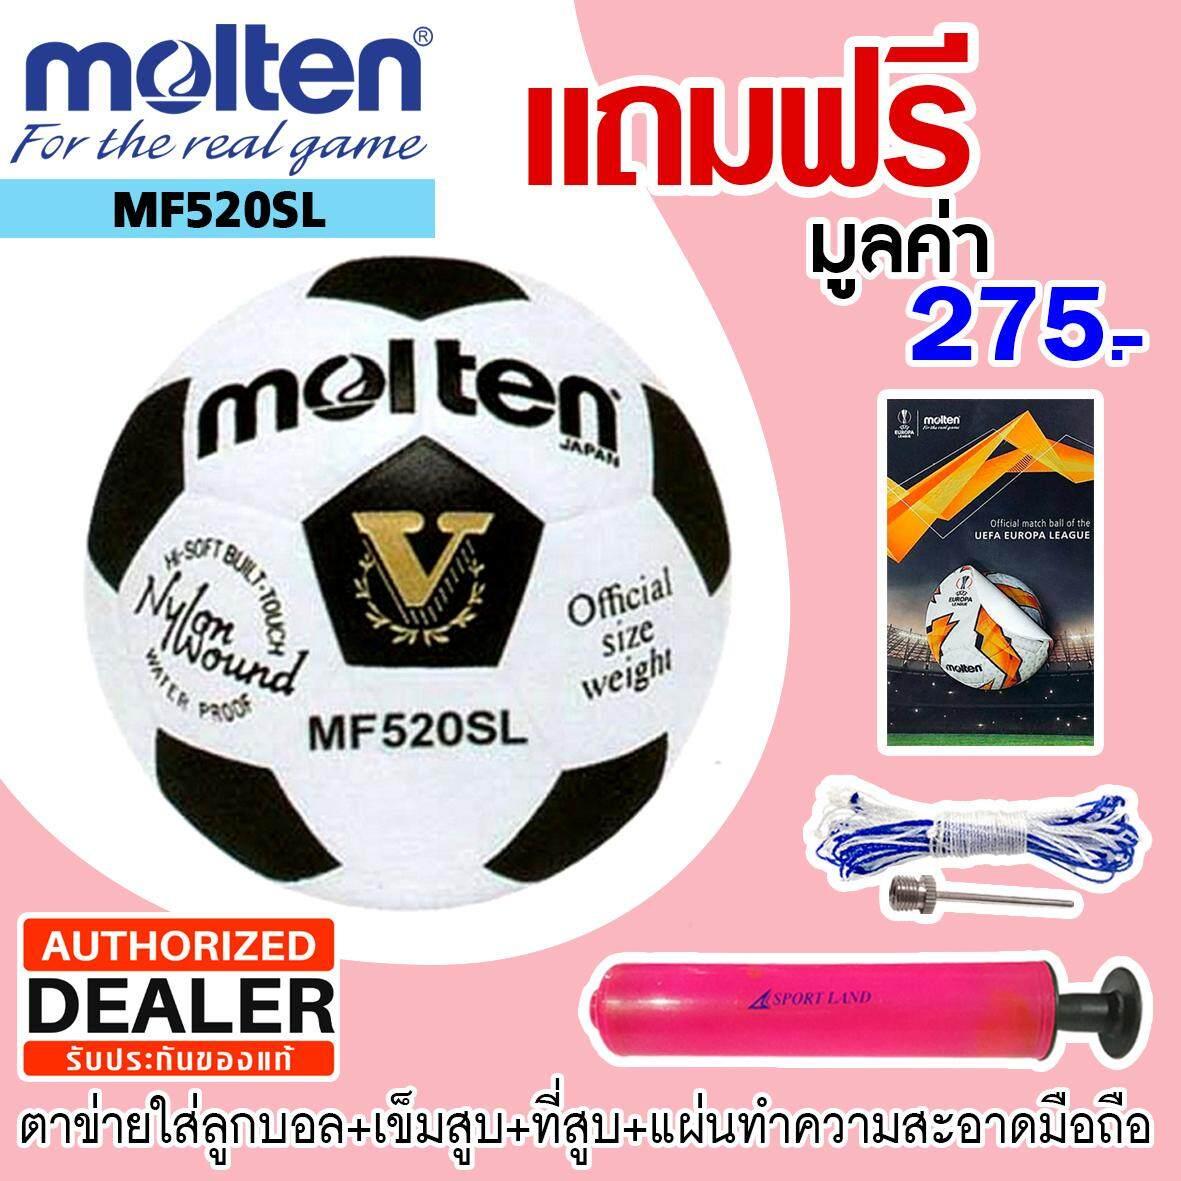 Molten ฟุตบอลFootball MOT PU MF520SL - White/Black แถมฟรี ตาข่ายใส่ลูกฟุตบอล + เข็มสูบสูบลม + สูบมือ SPL รุ่น SL6 สีชมพู